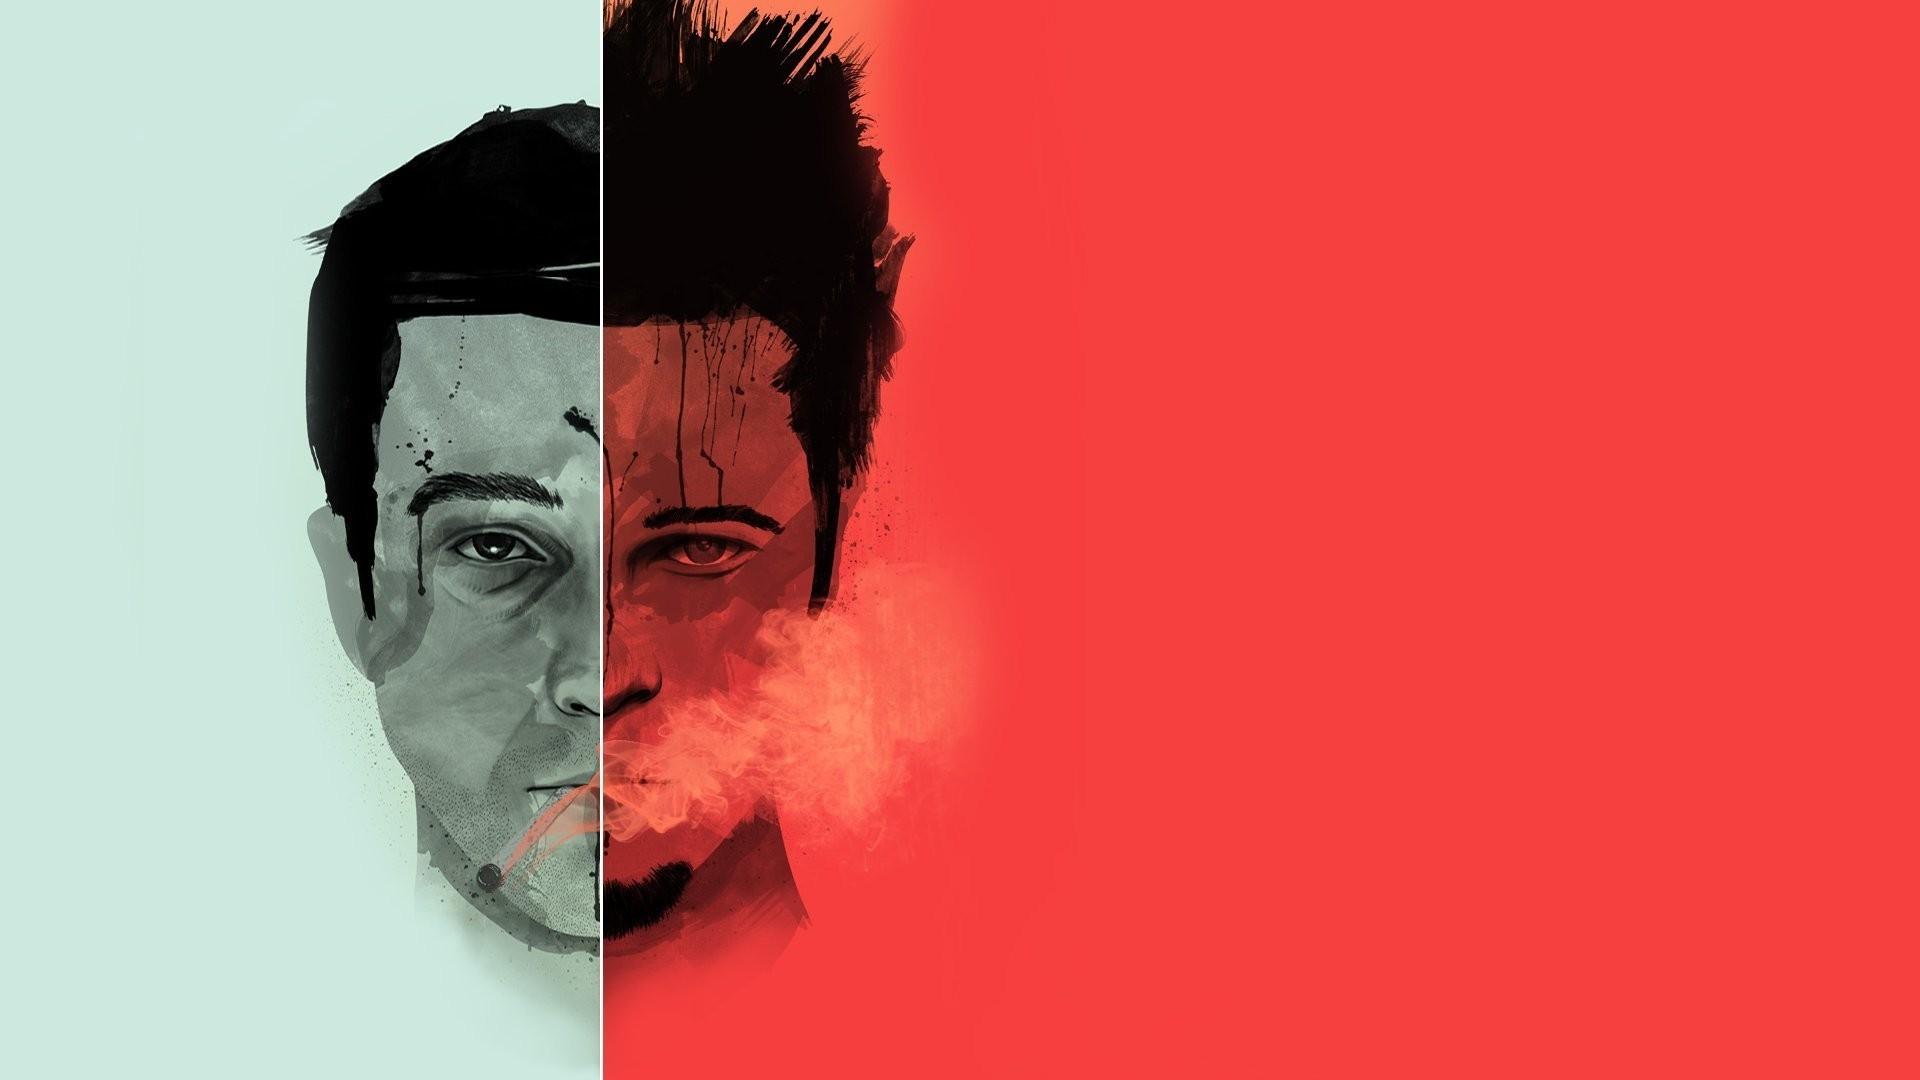 Jin Kazama Hd Wallpaper Movies Fight Club Brad Pitt Tyler Durden Wallpapers Hd